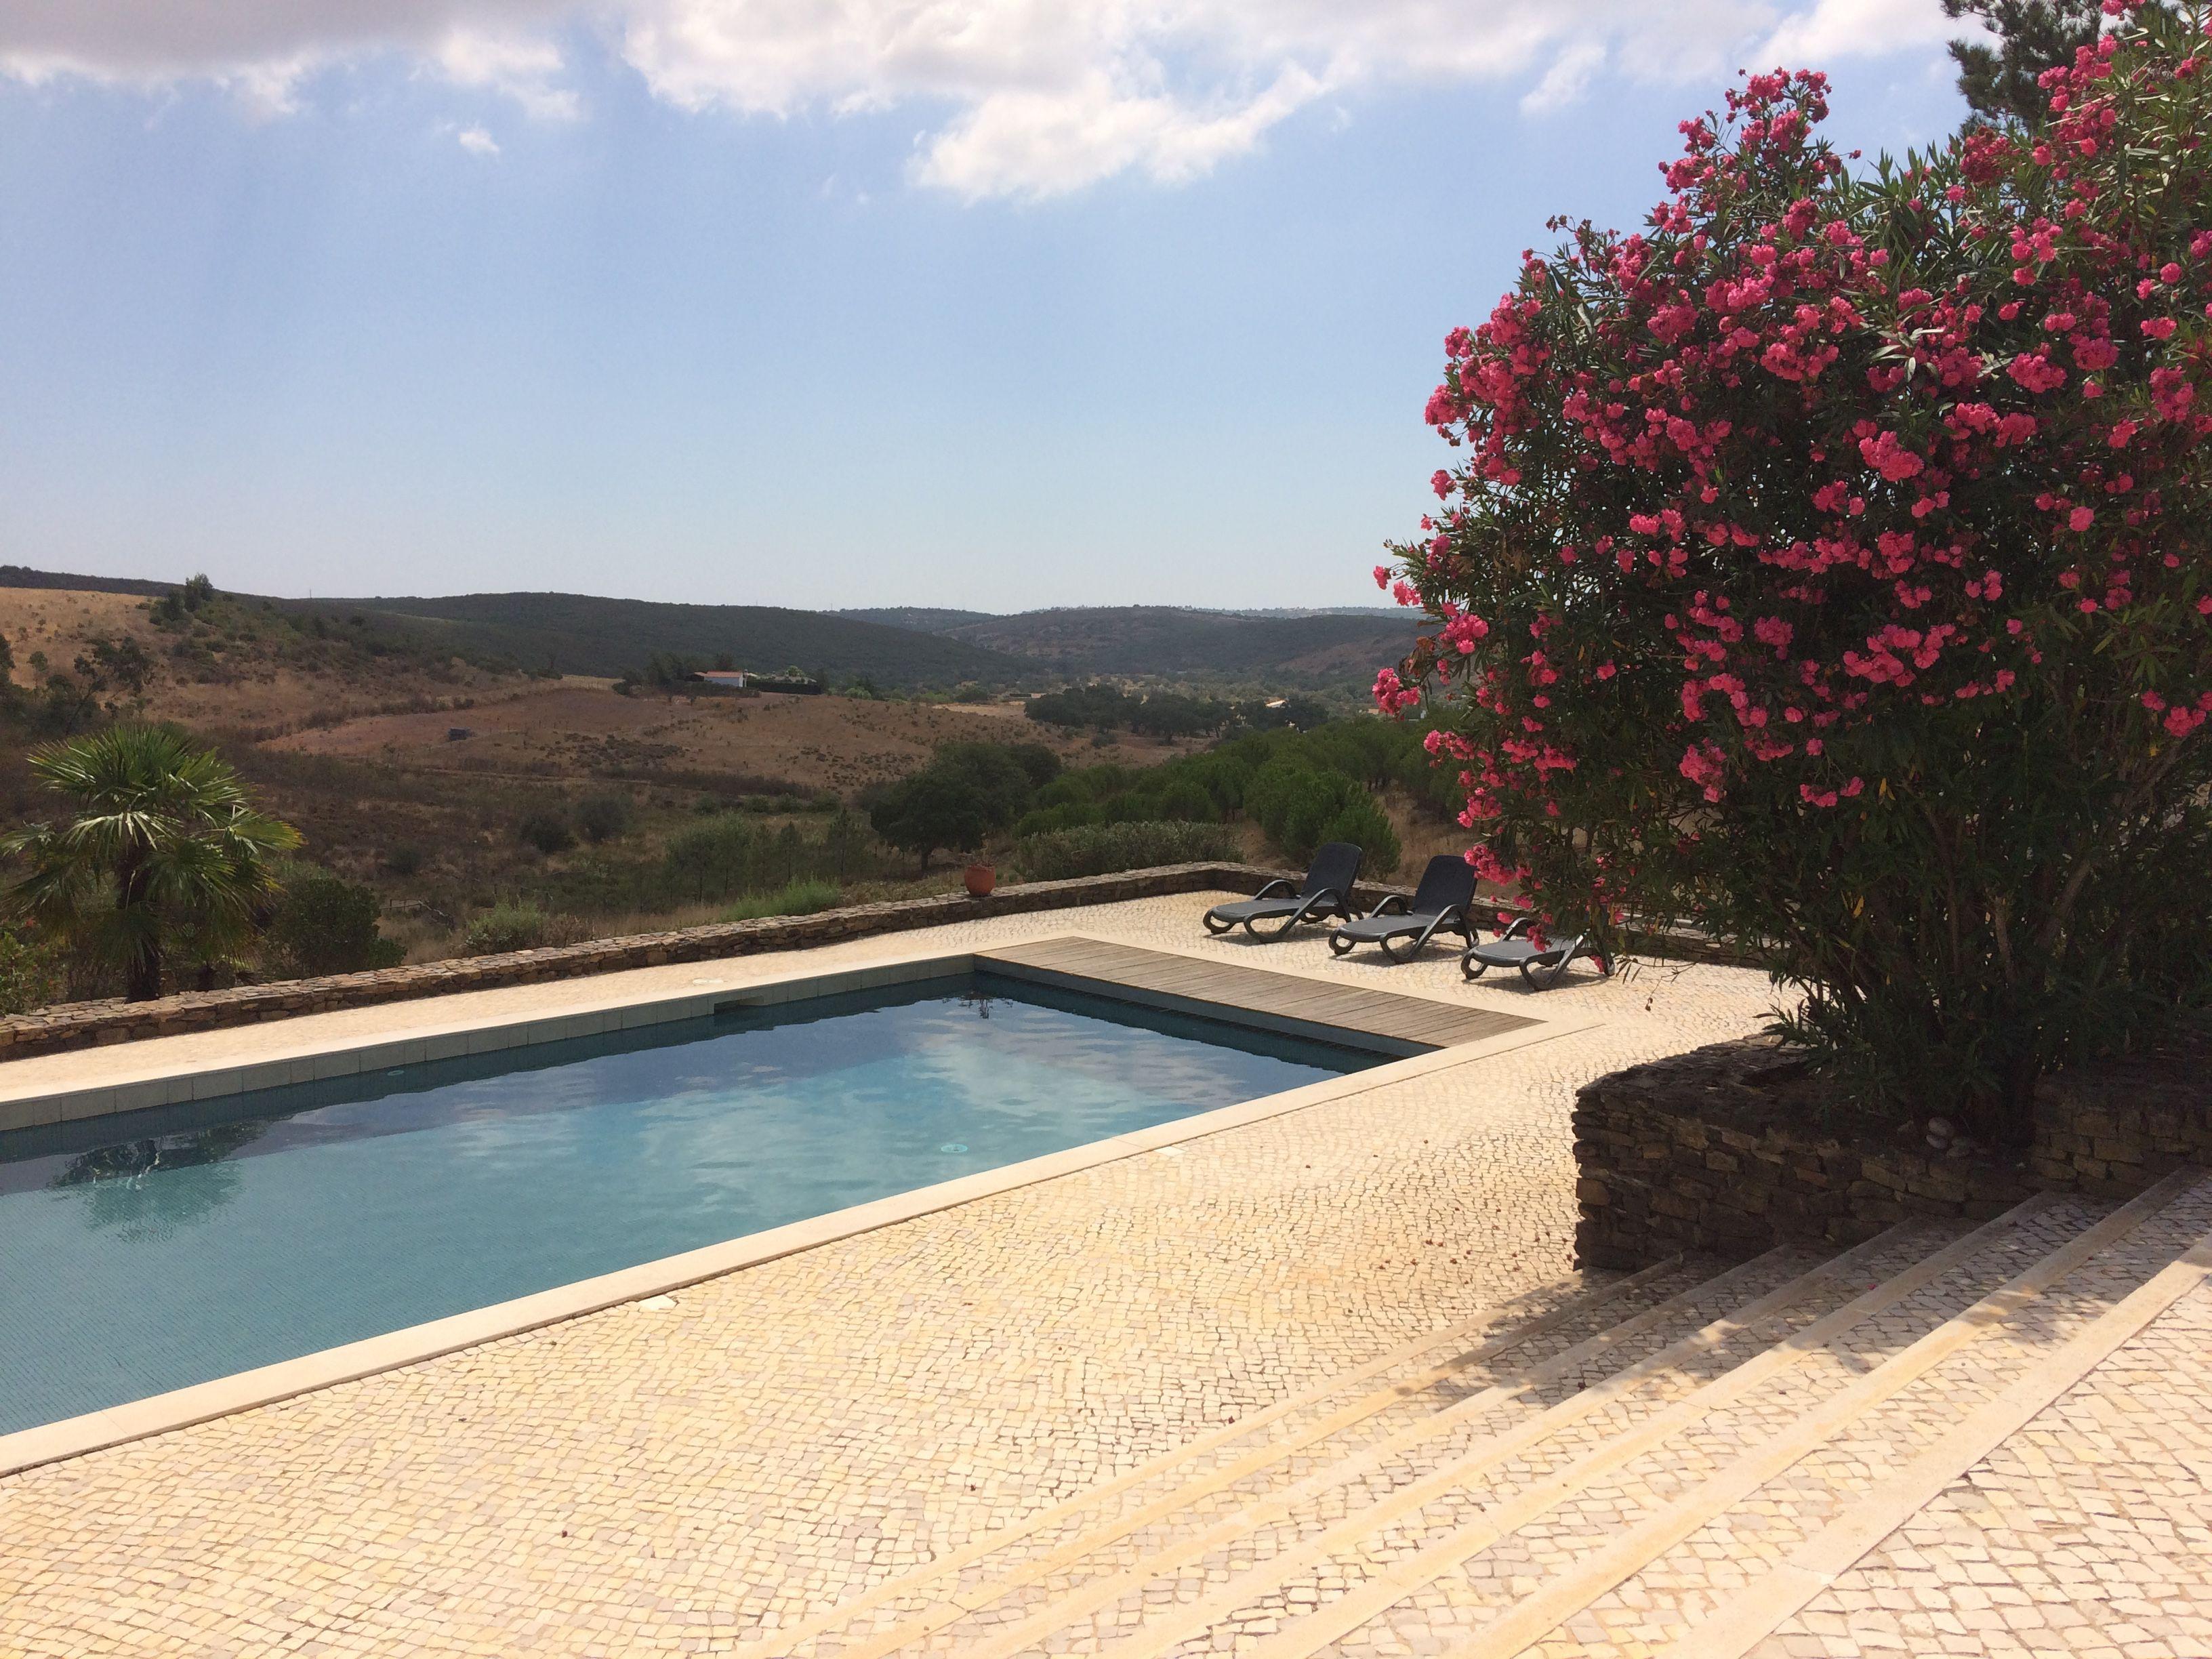 algarve-vakantie-vila-privacy-zwembad